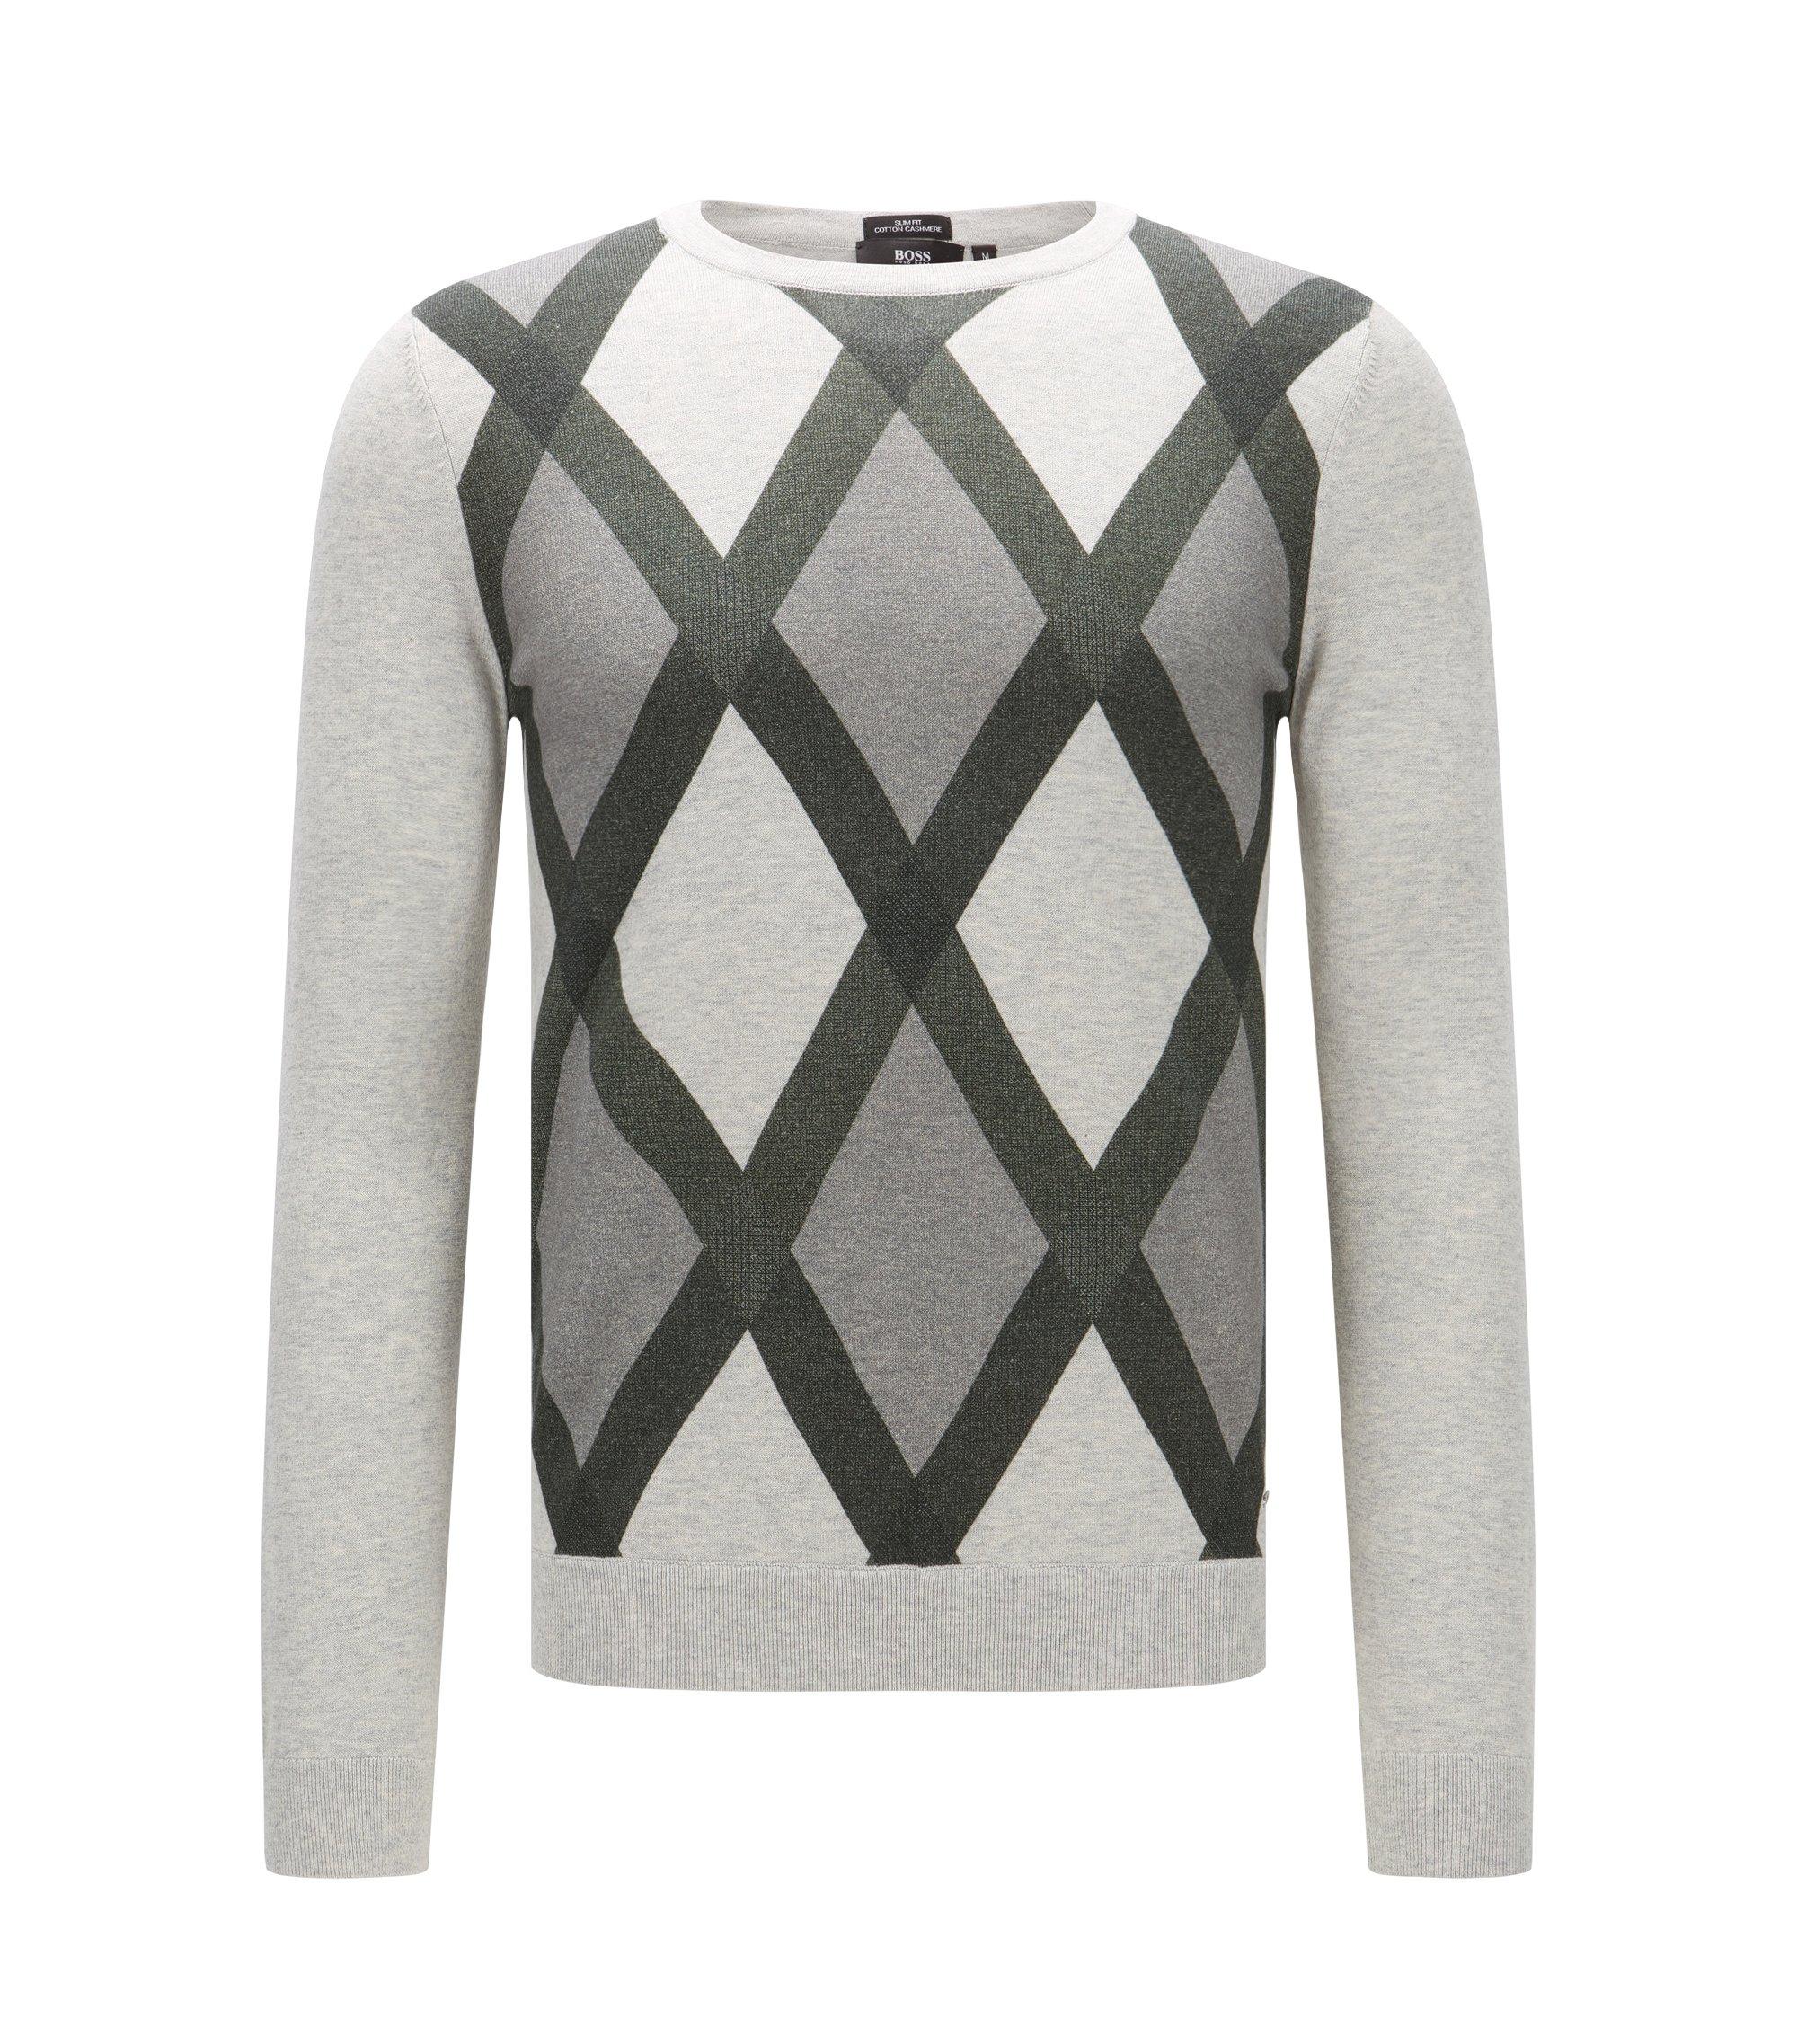 'Niras' | Argyle Cotton Cashmere Sweater, Open Grey